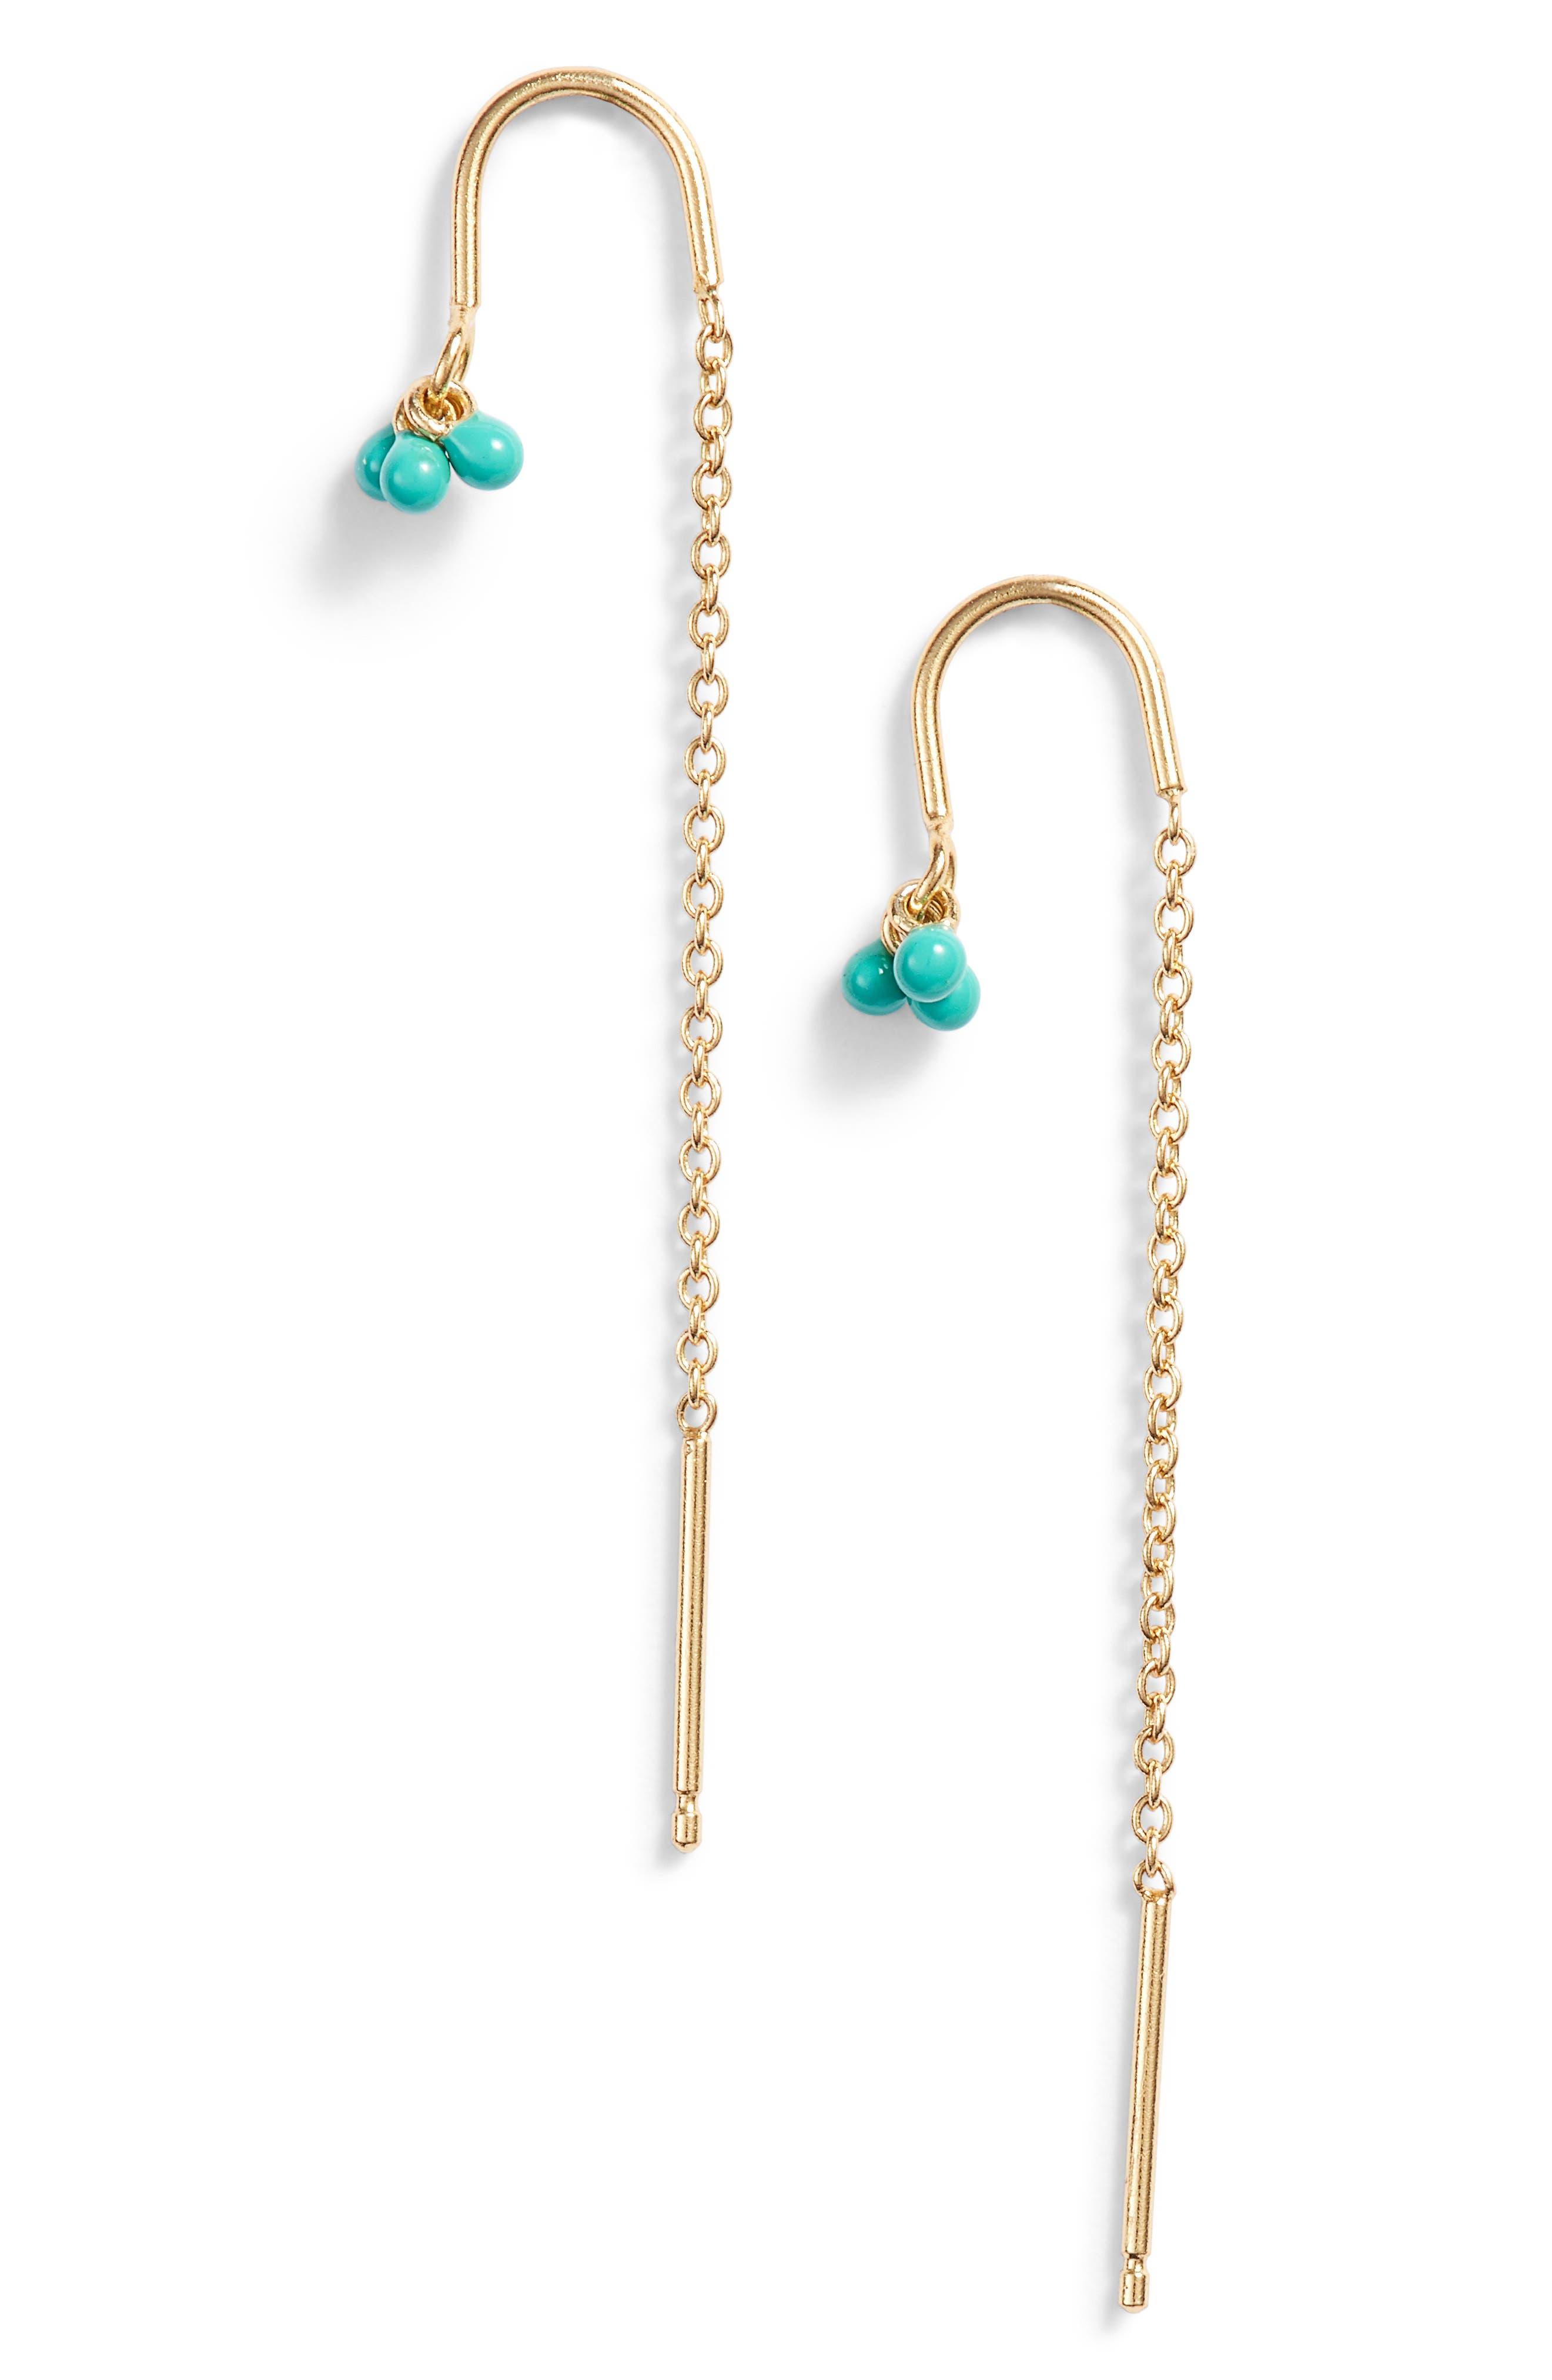 Enamel Cluster Threader Earrings,                         Main,                         color, TURQUOISE